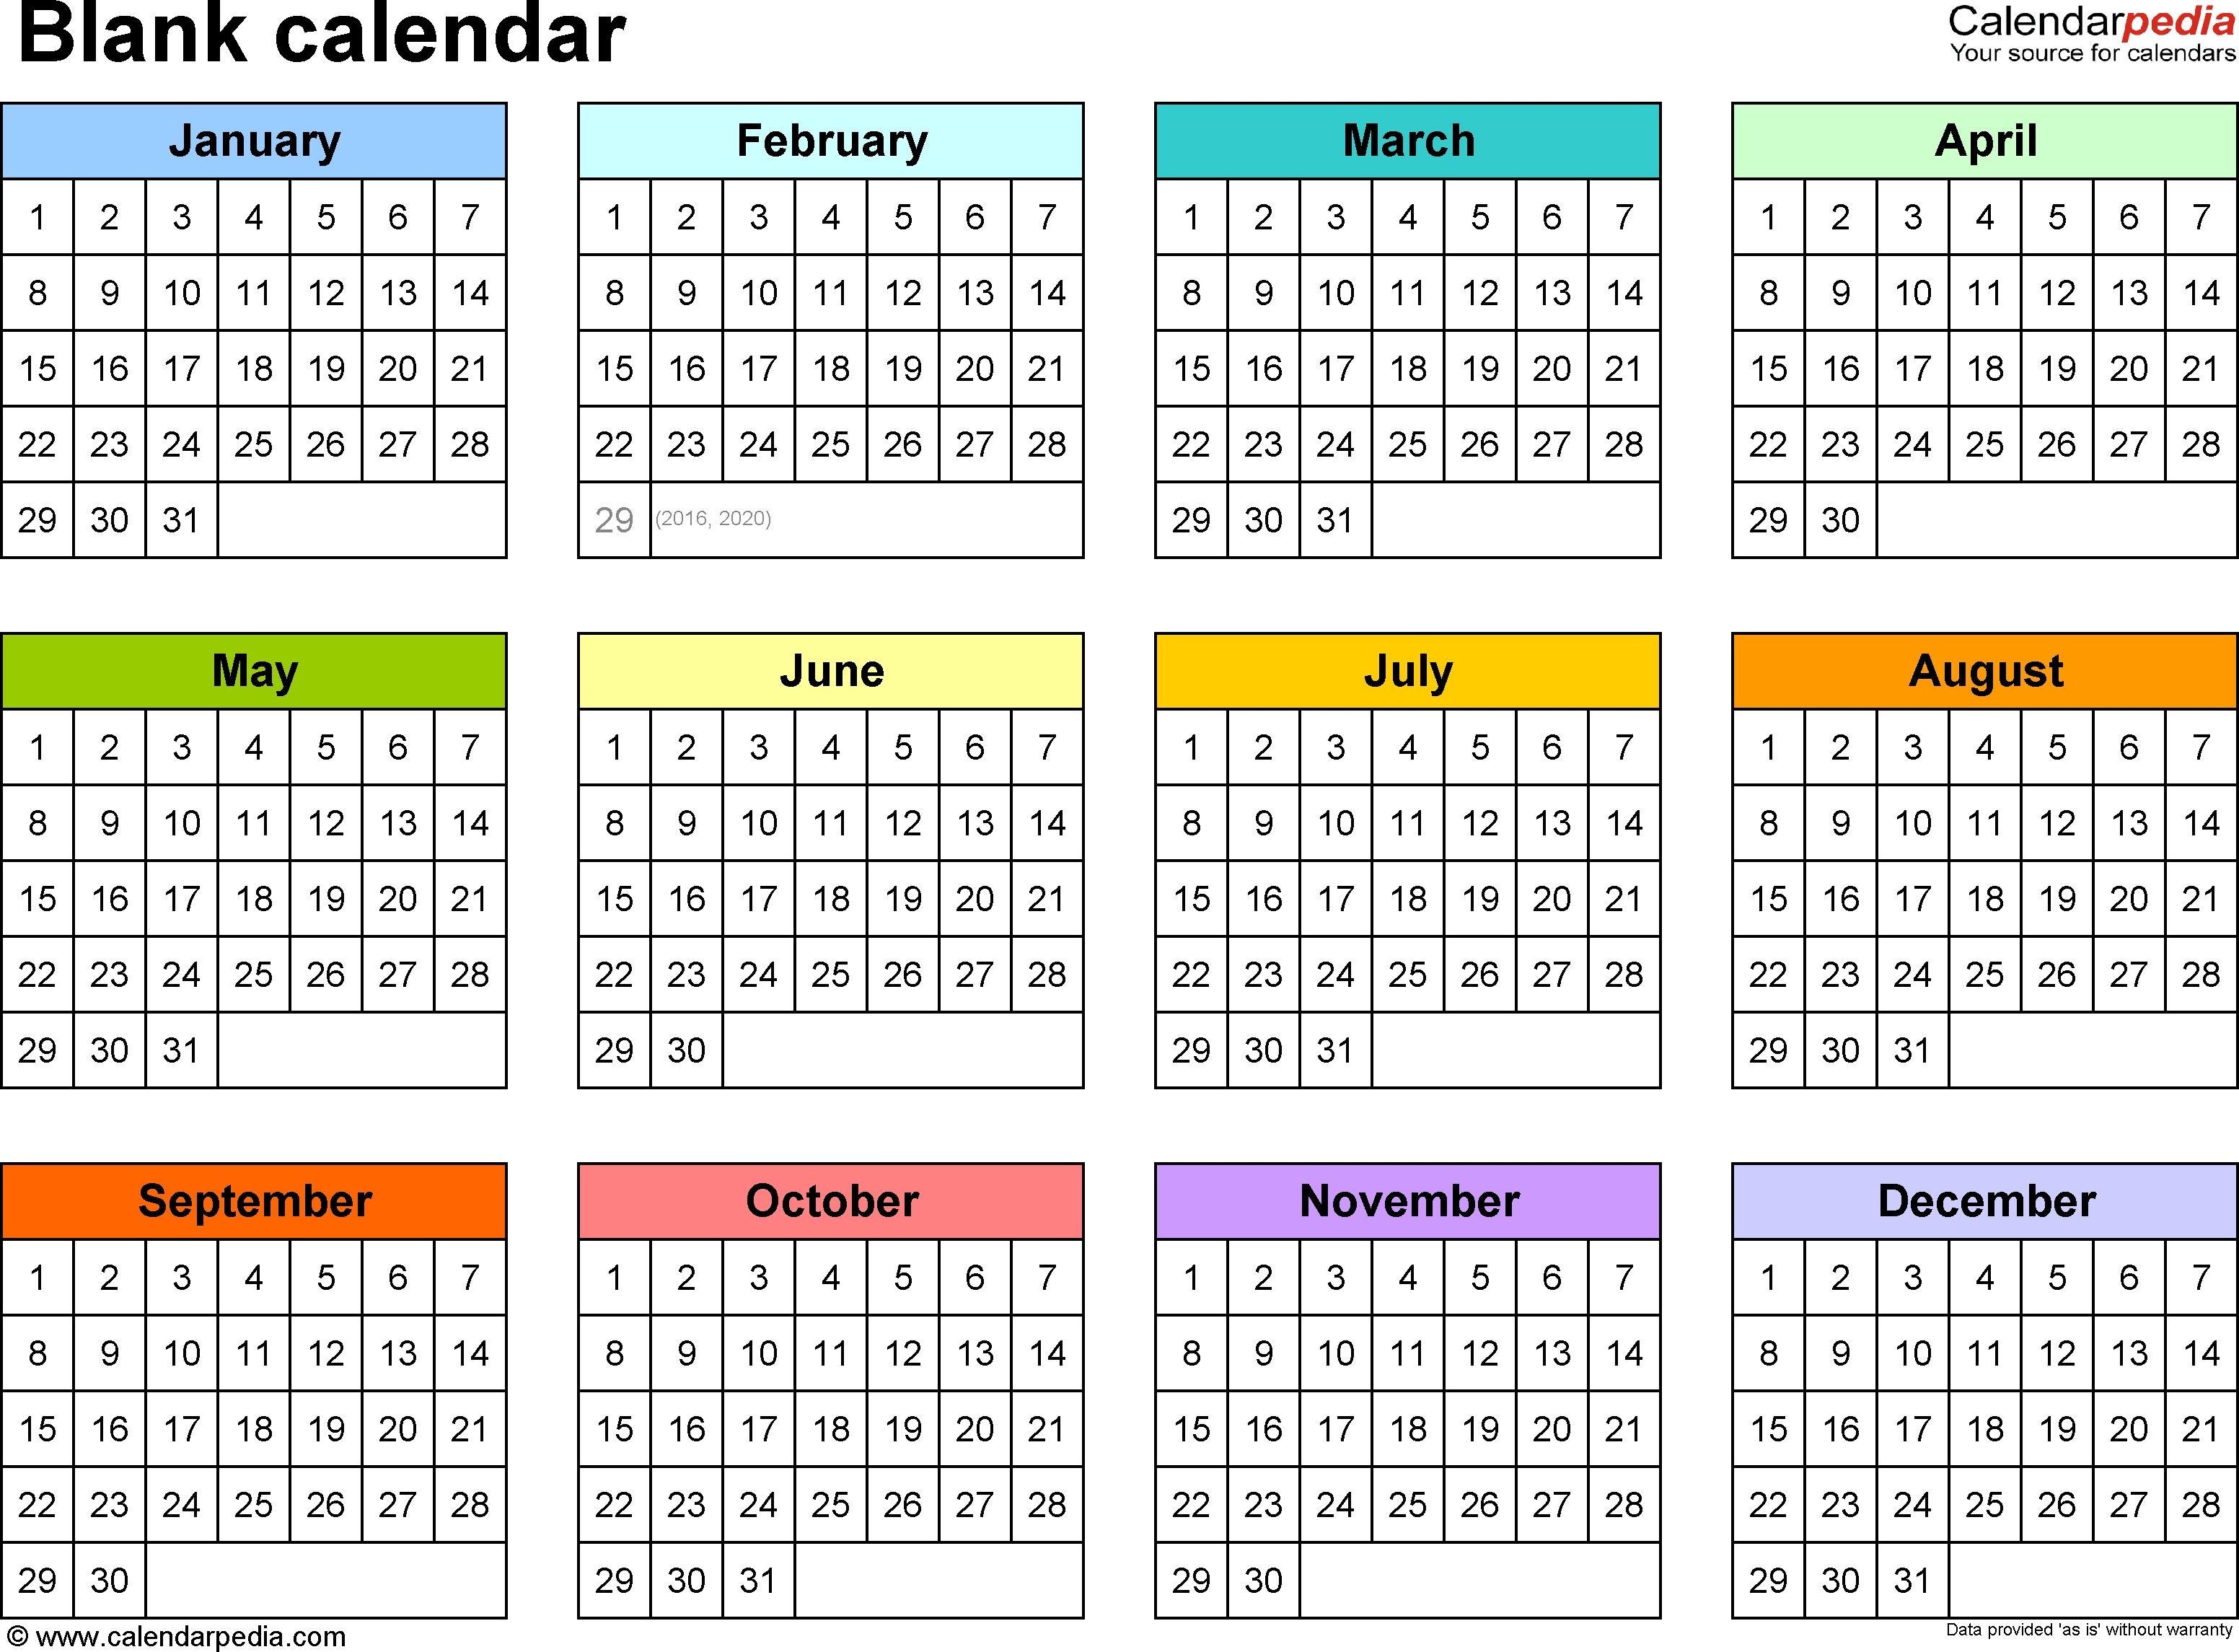 Blank Calendars - Free Printable Microsoft Excel Templates-Print Blank Calander Microsoft 365